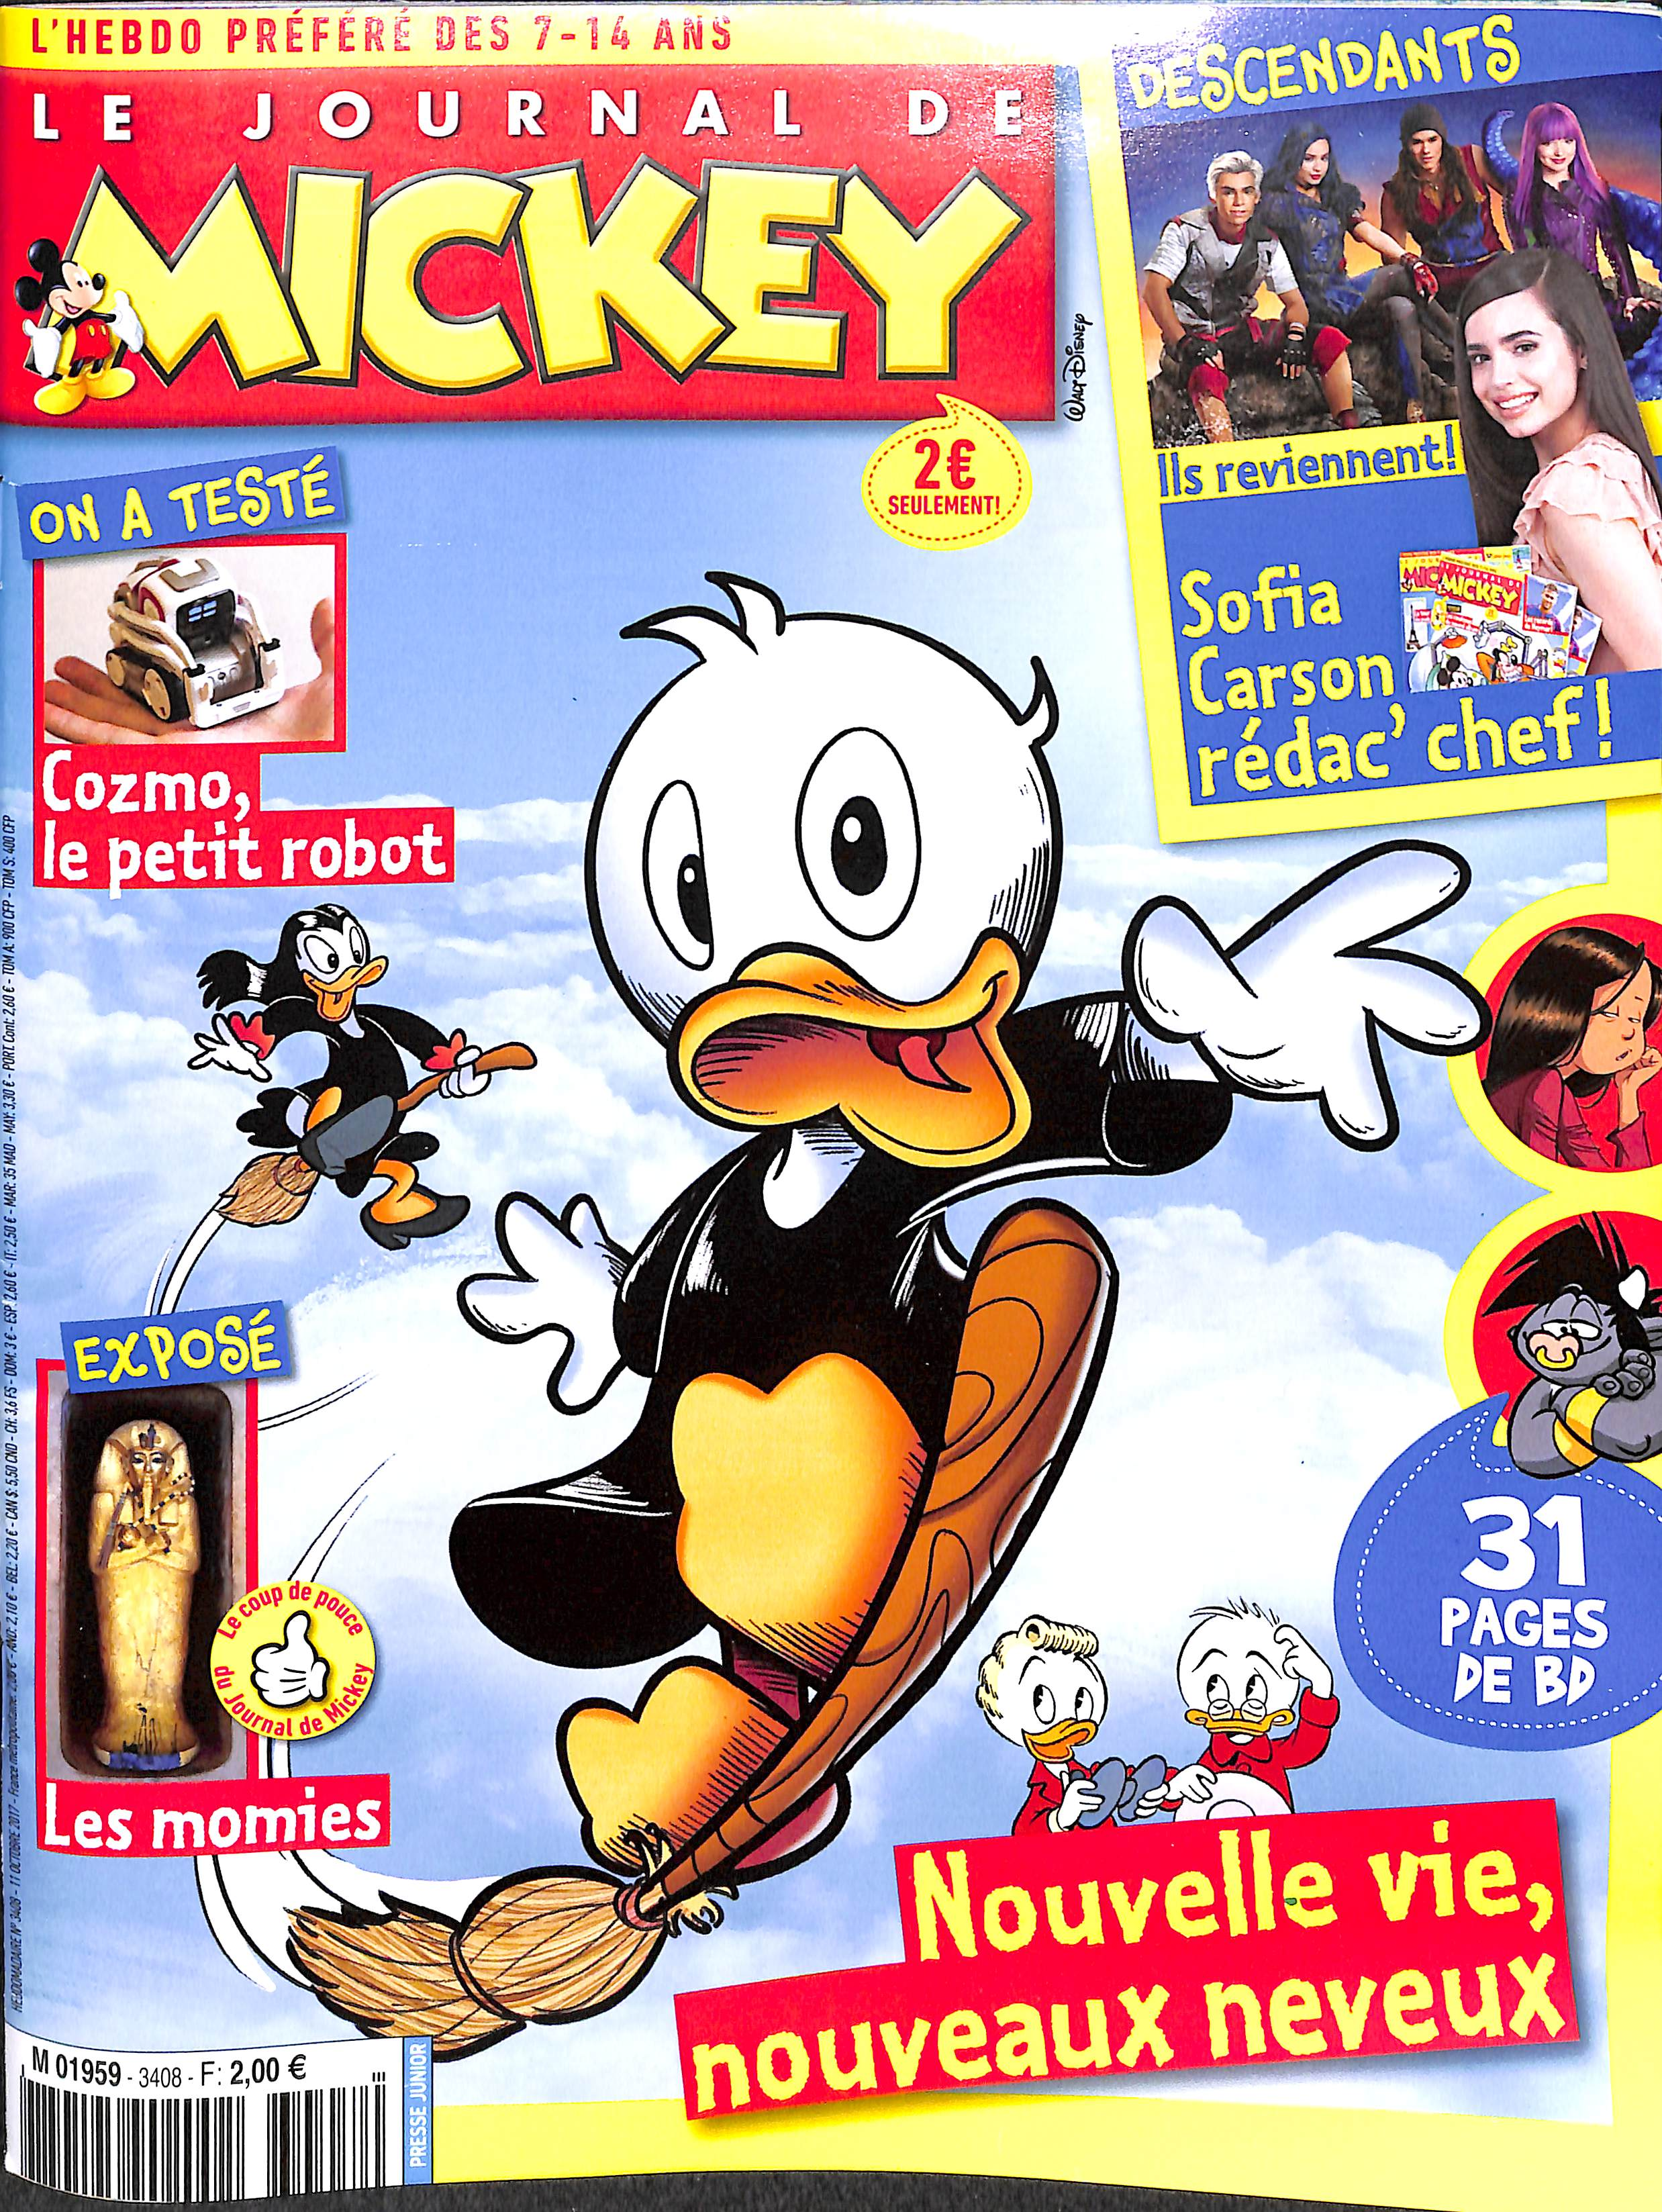 Le Journal de Mickey N° 3409 Octobre 2017